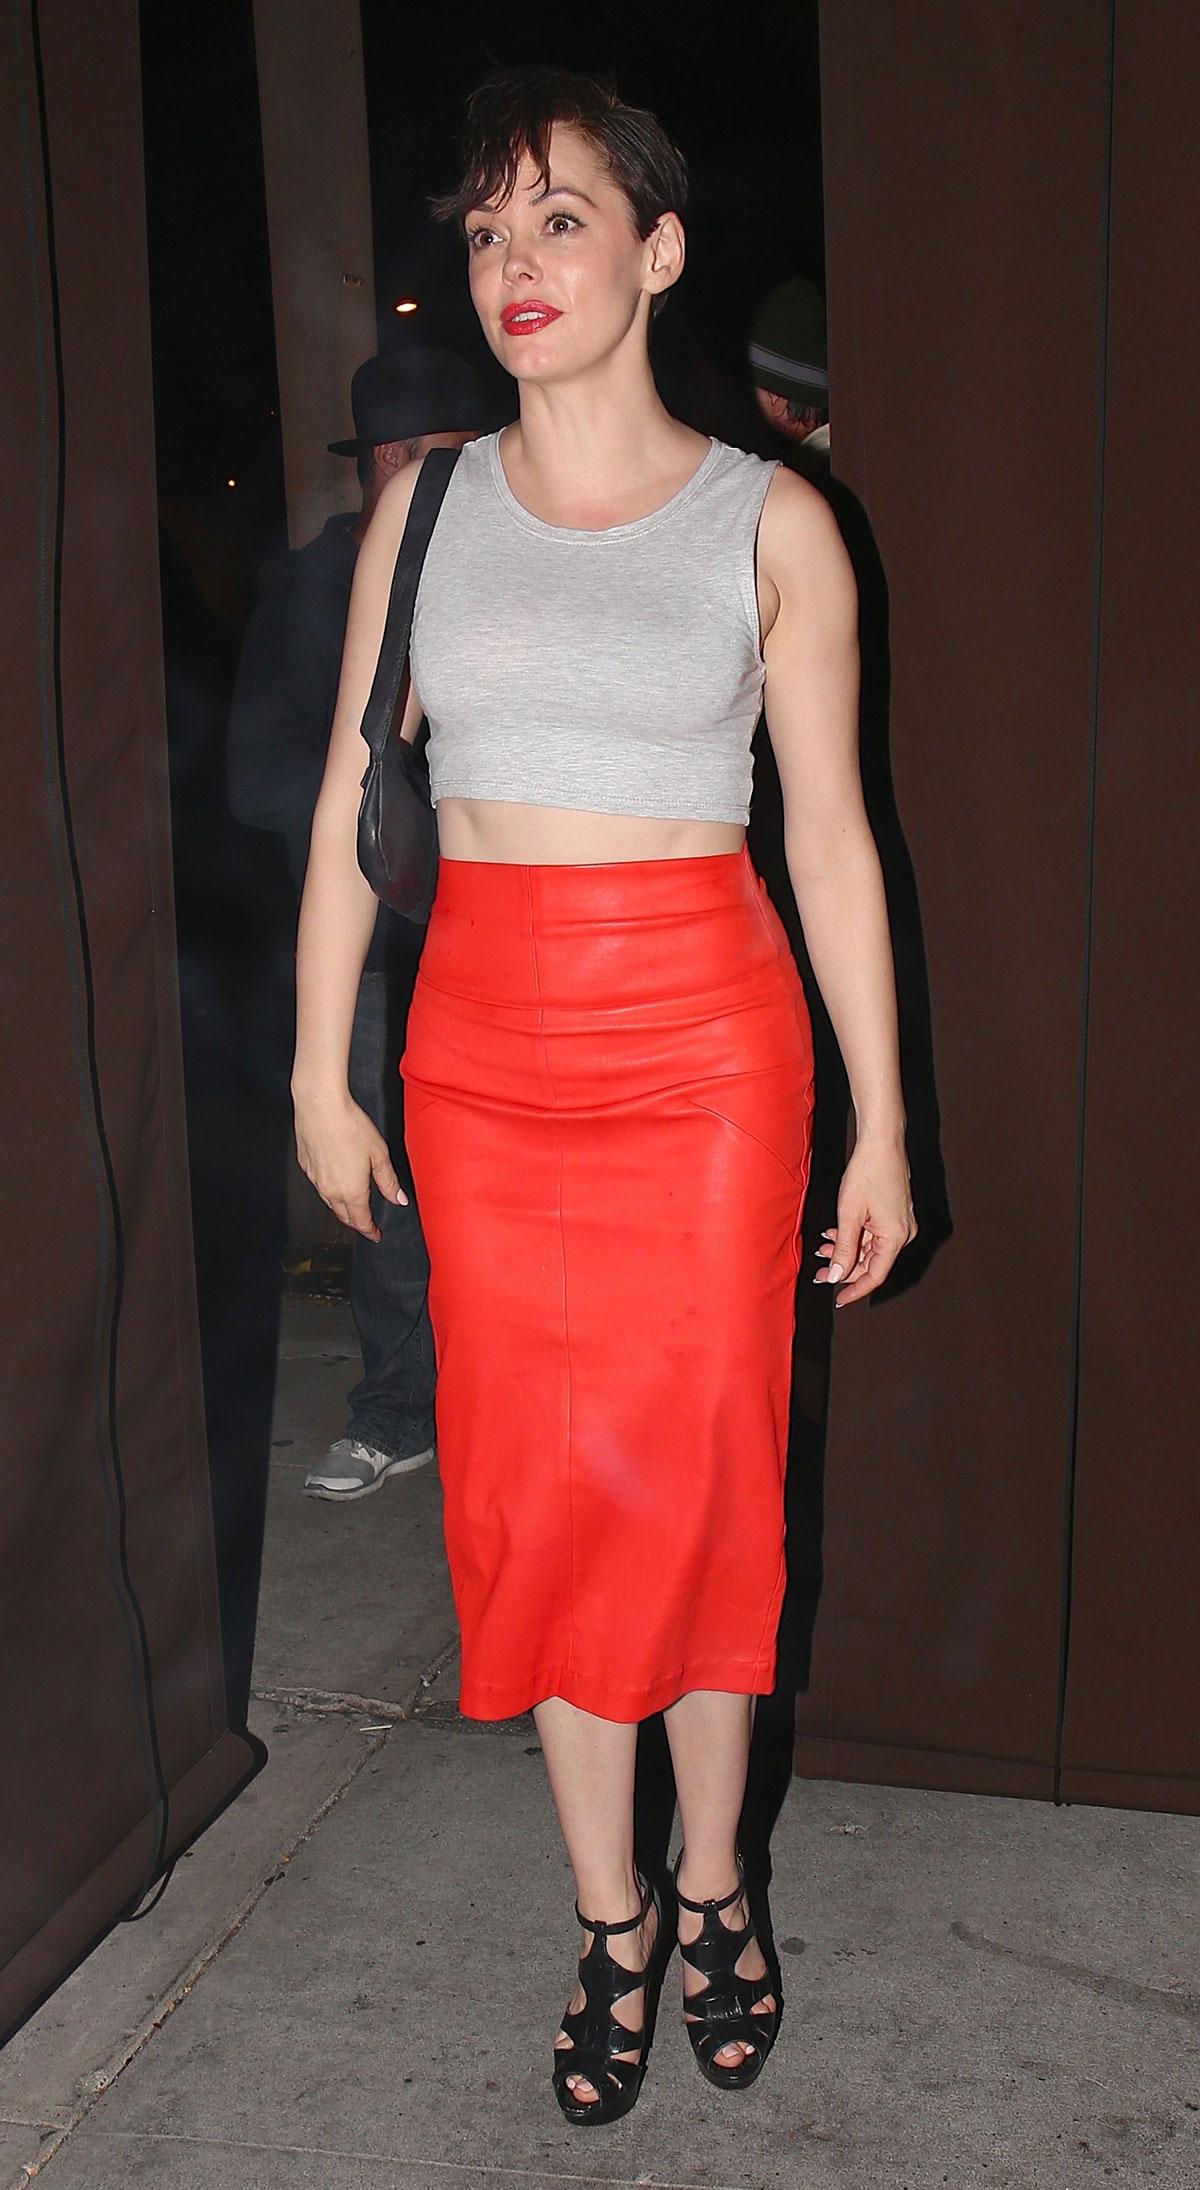 Rose Mcgowan leaves Craigs restaurant after having a dinner